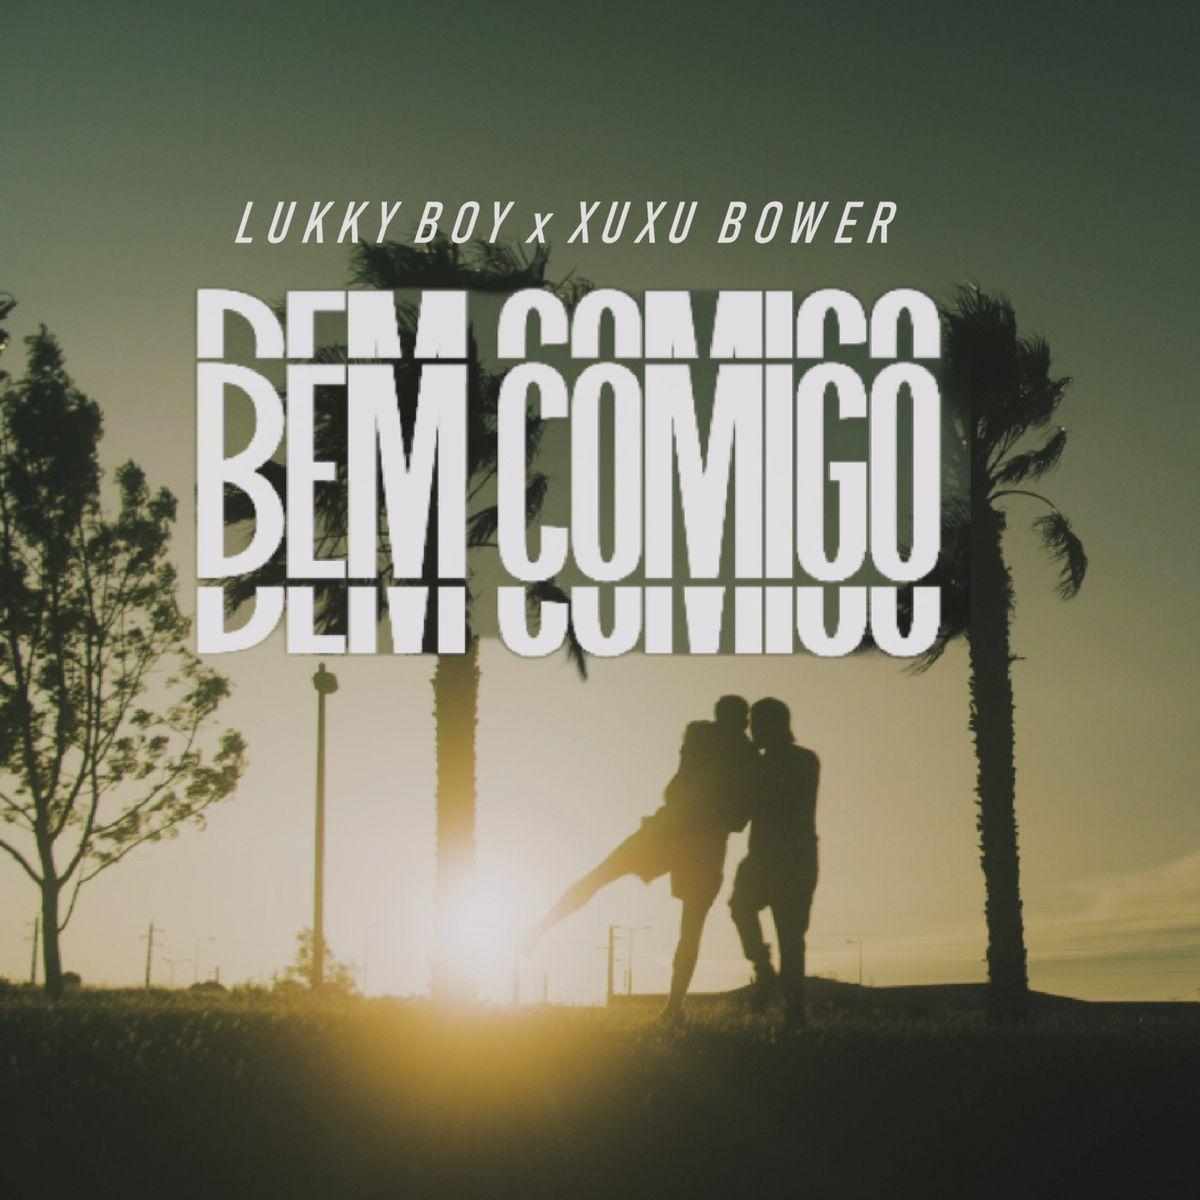 Lukky Boy x Xuxu Bower - Bem Comigo